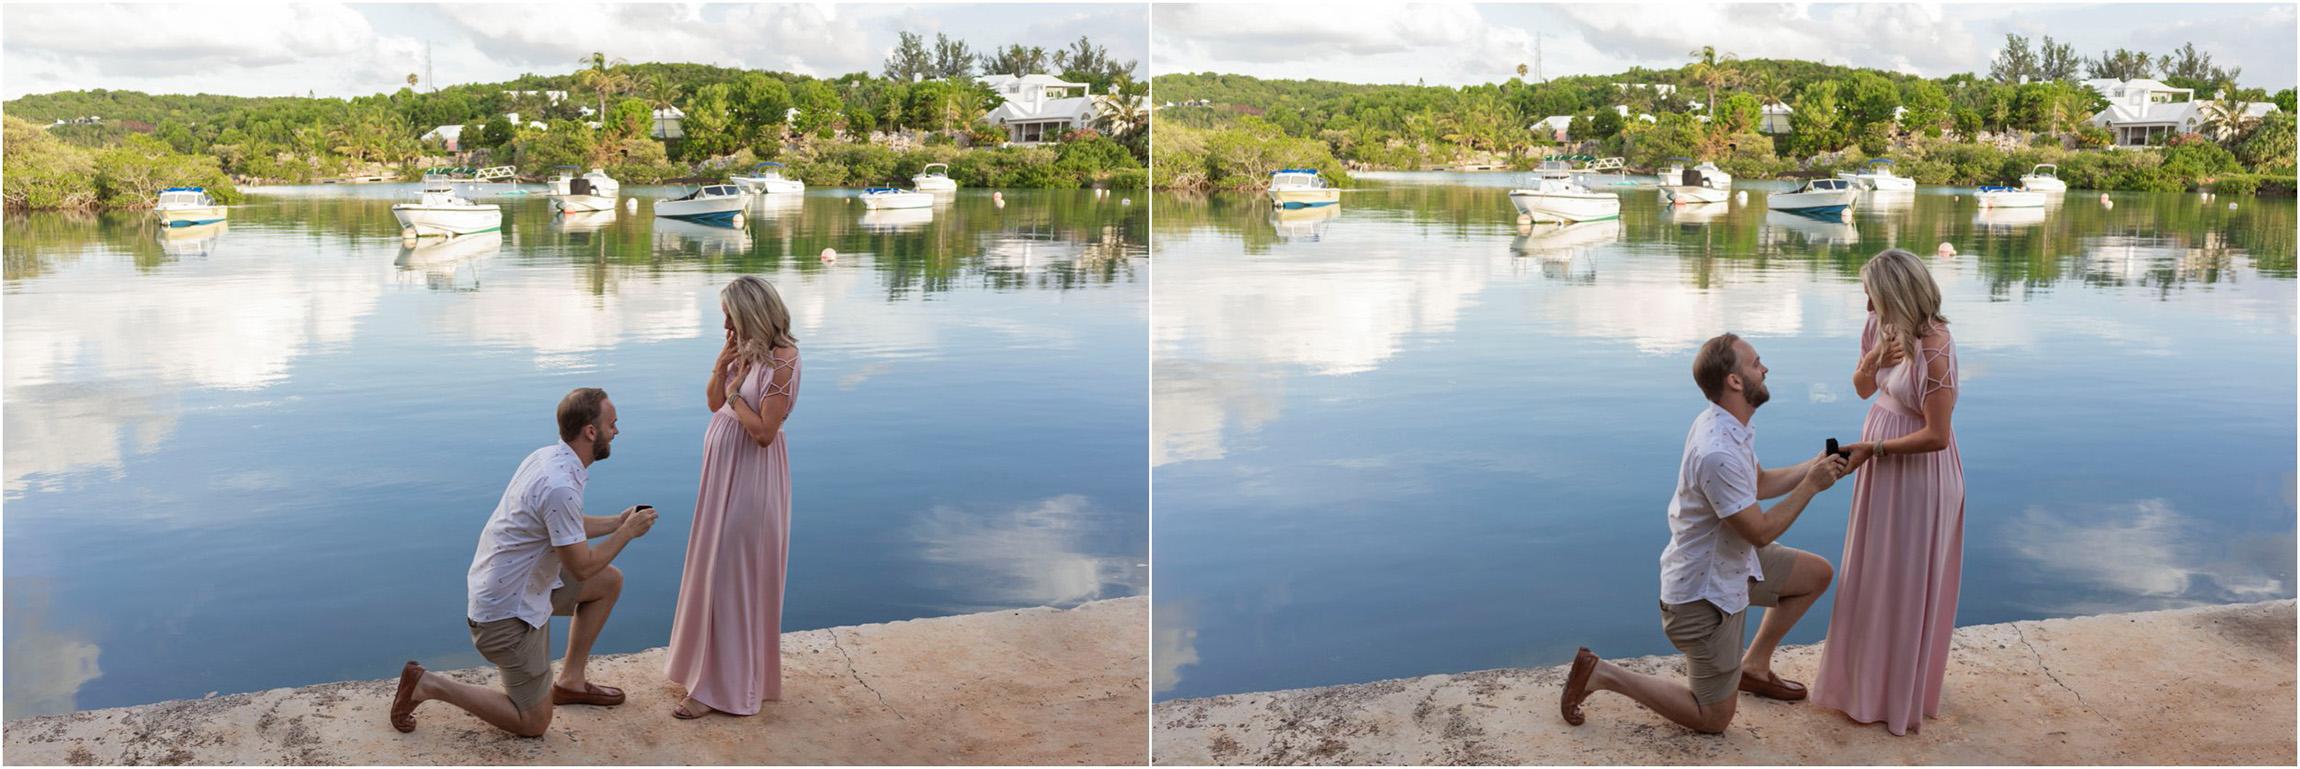 ©FianderFoto_Bermuda_Tom Moore's Jungle_Proposal Maternity Photographer_Erika_Andy_003.jpg